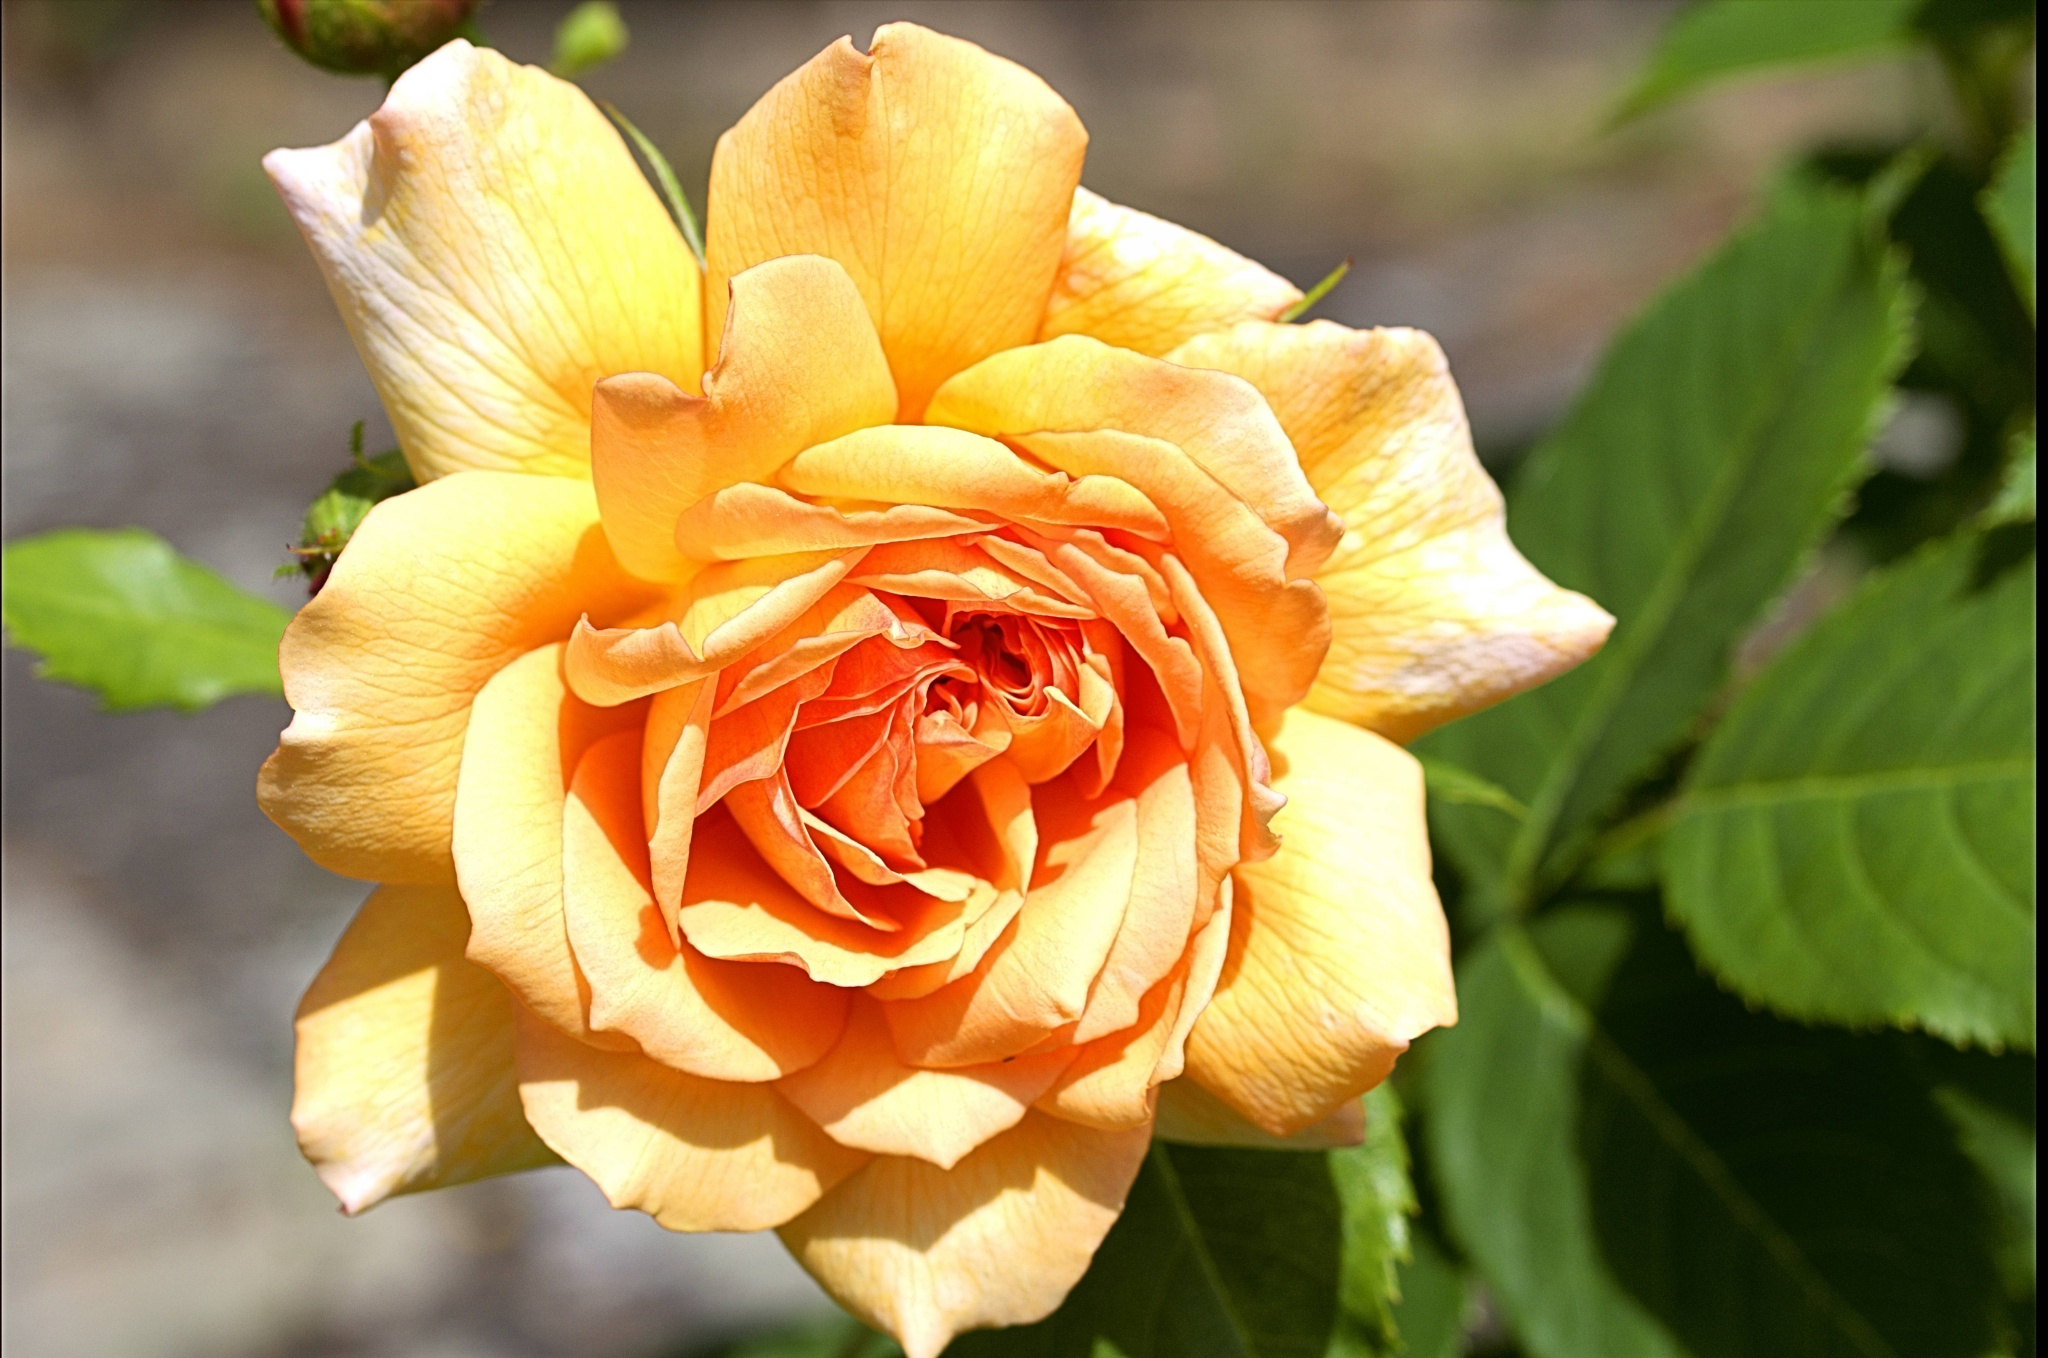 rose by paulrobin.andrews